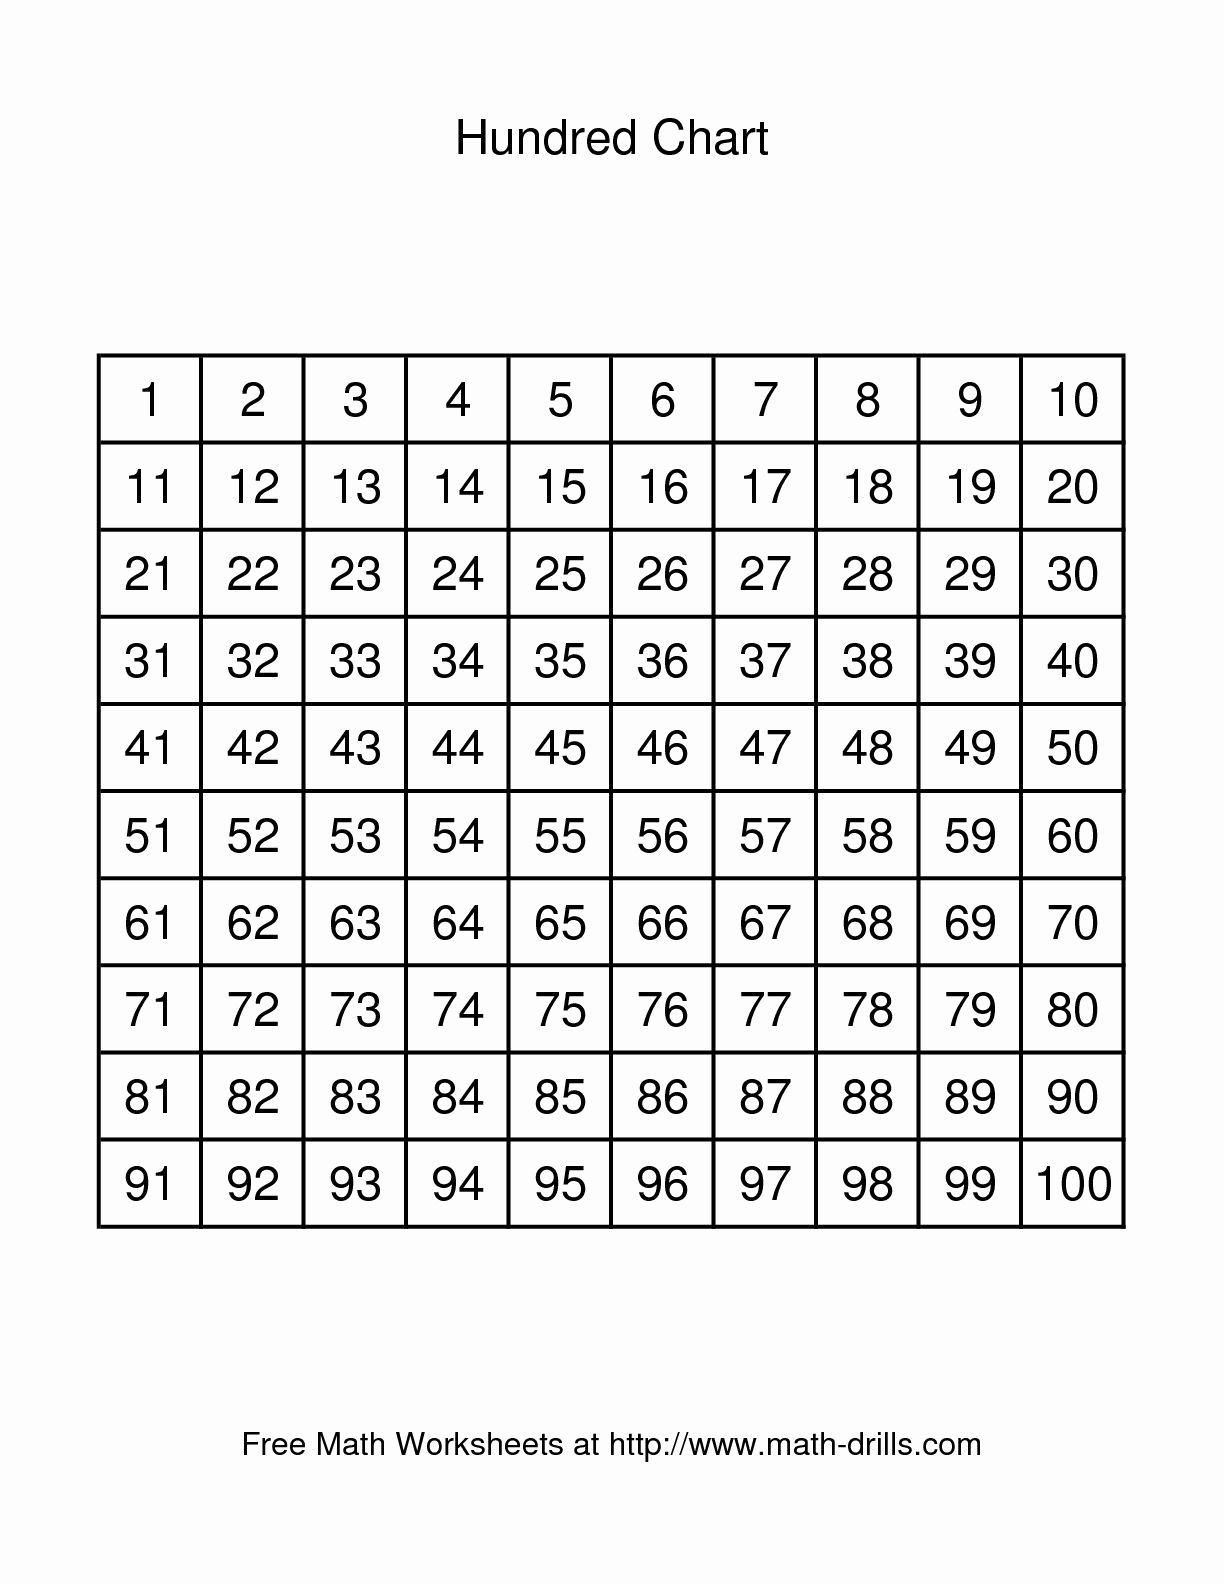 100 Chart Printable Di